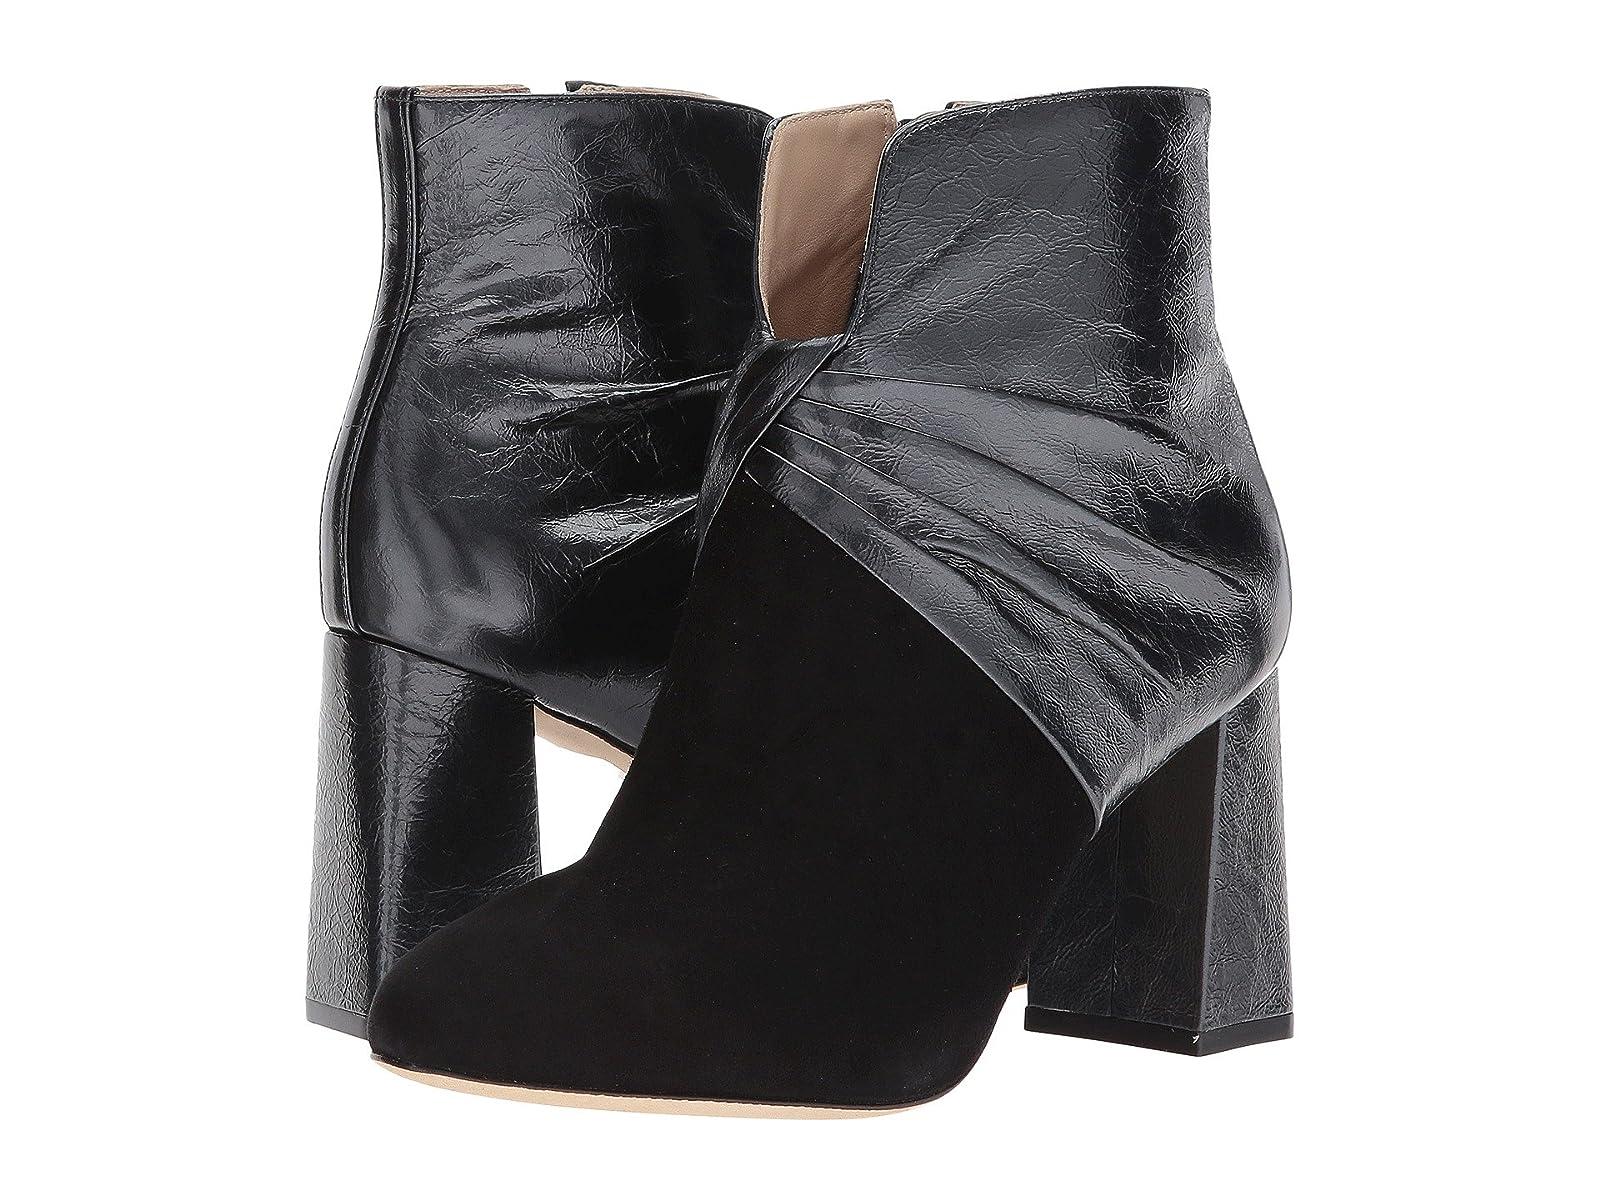 ZAC Zac Posen CorinnaCheap and distinctive eye-catching shoes